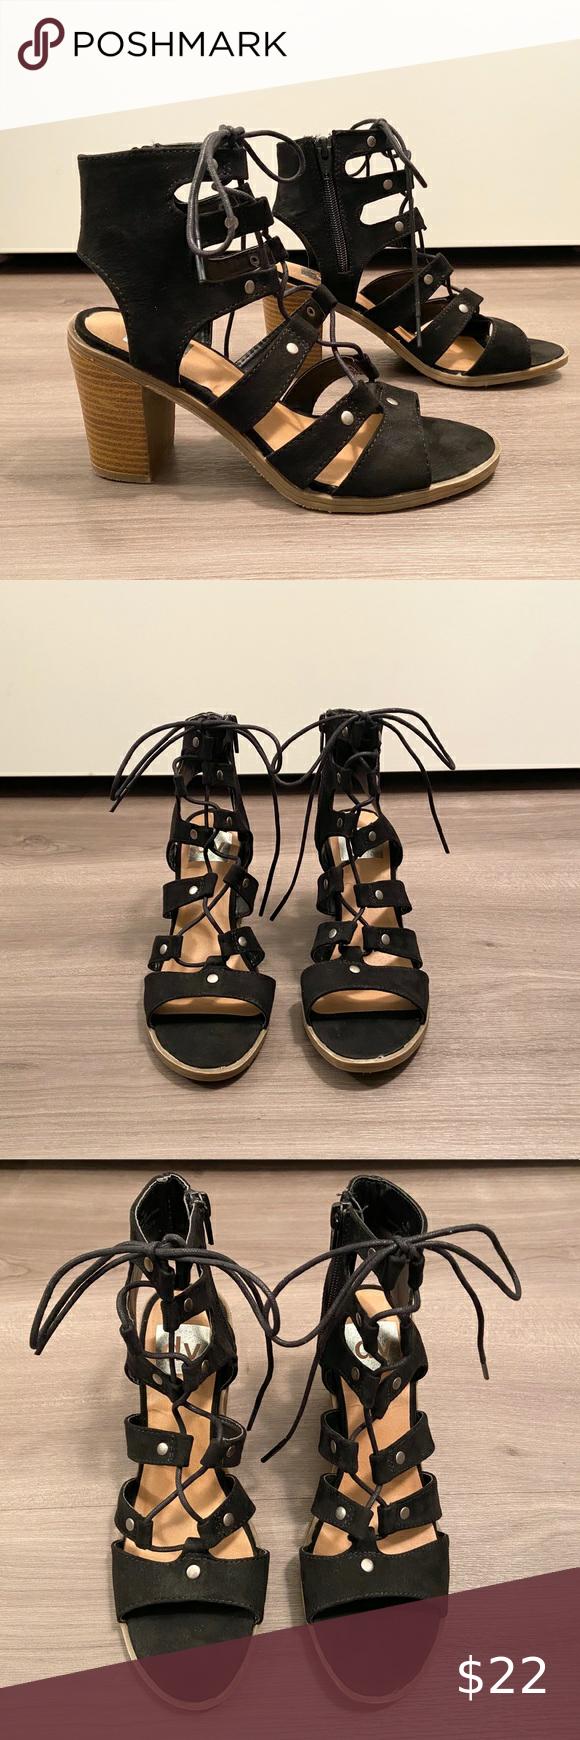 Dolce Vita Women Brown Heels US 8 | eBay